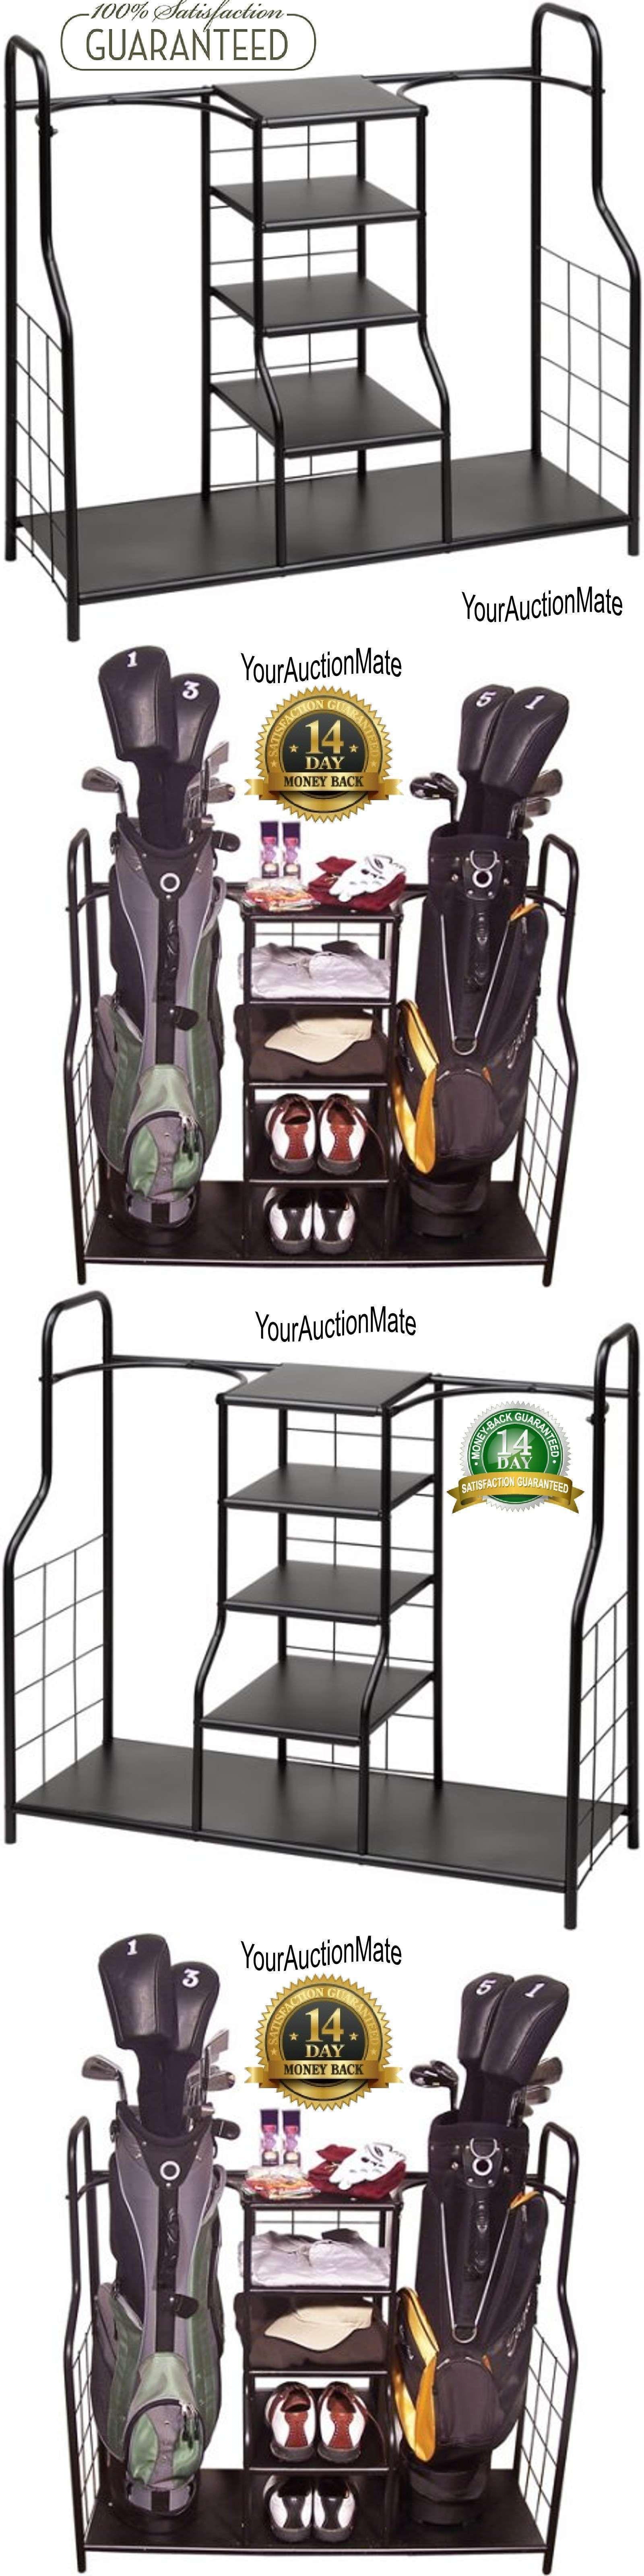 Other Golf Equipment 181155: Golf Bag Organizer Garage Metal Storage Holder  Portable Clubs Shoes Accessories